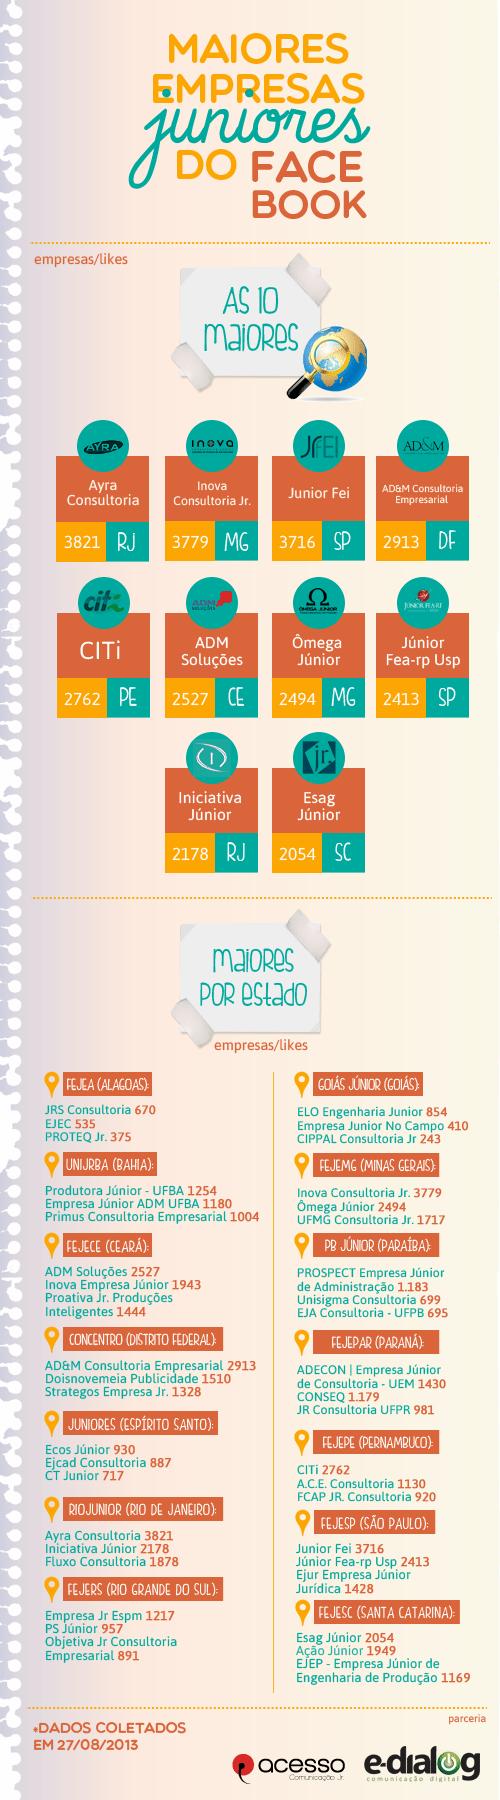 Maiores Empresas Juniores do Brasil no Facebook